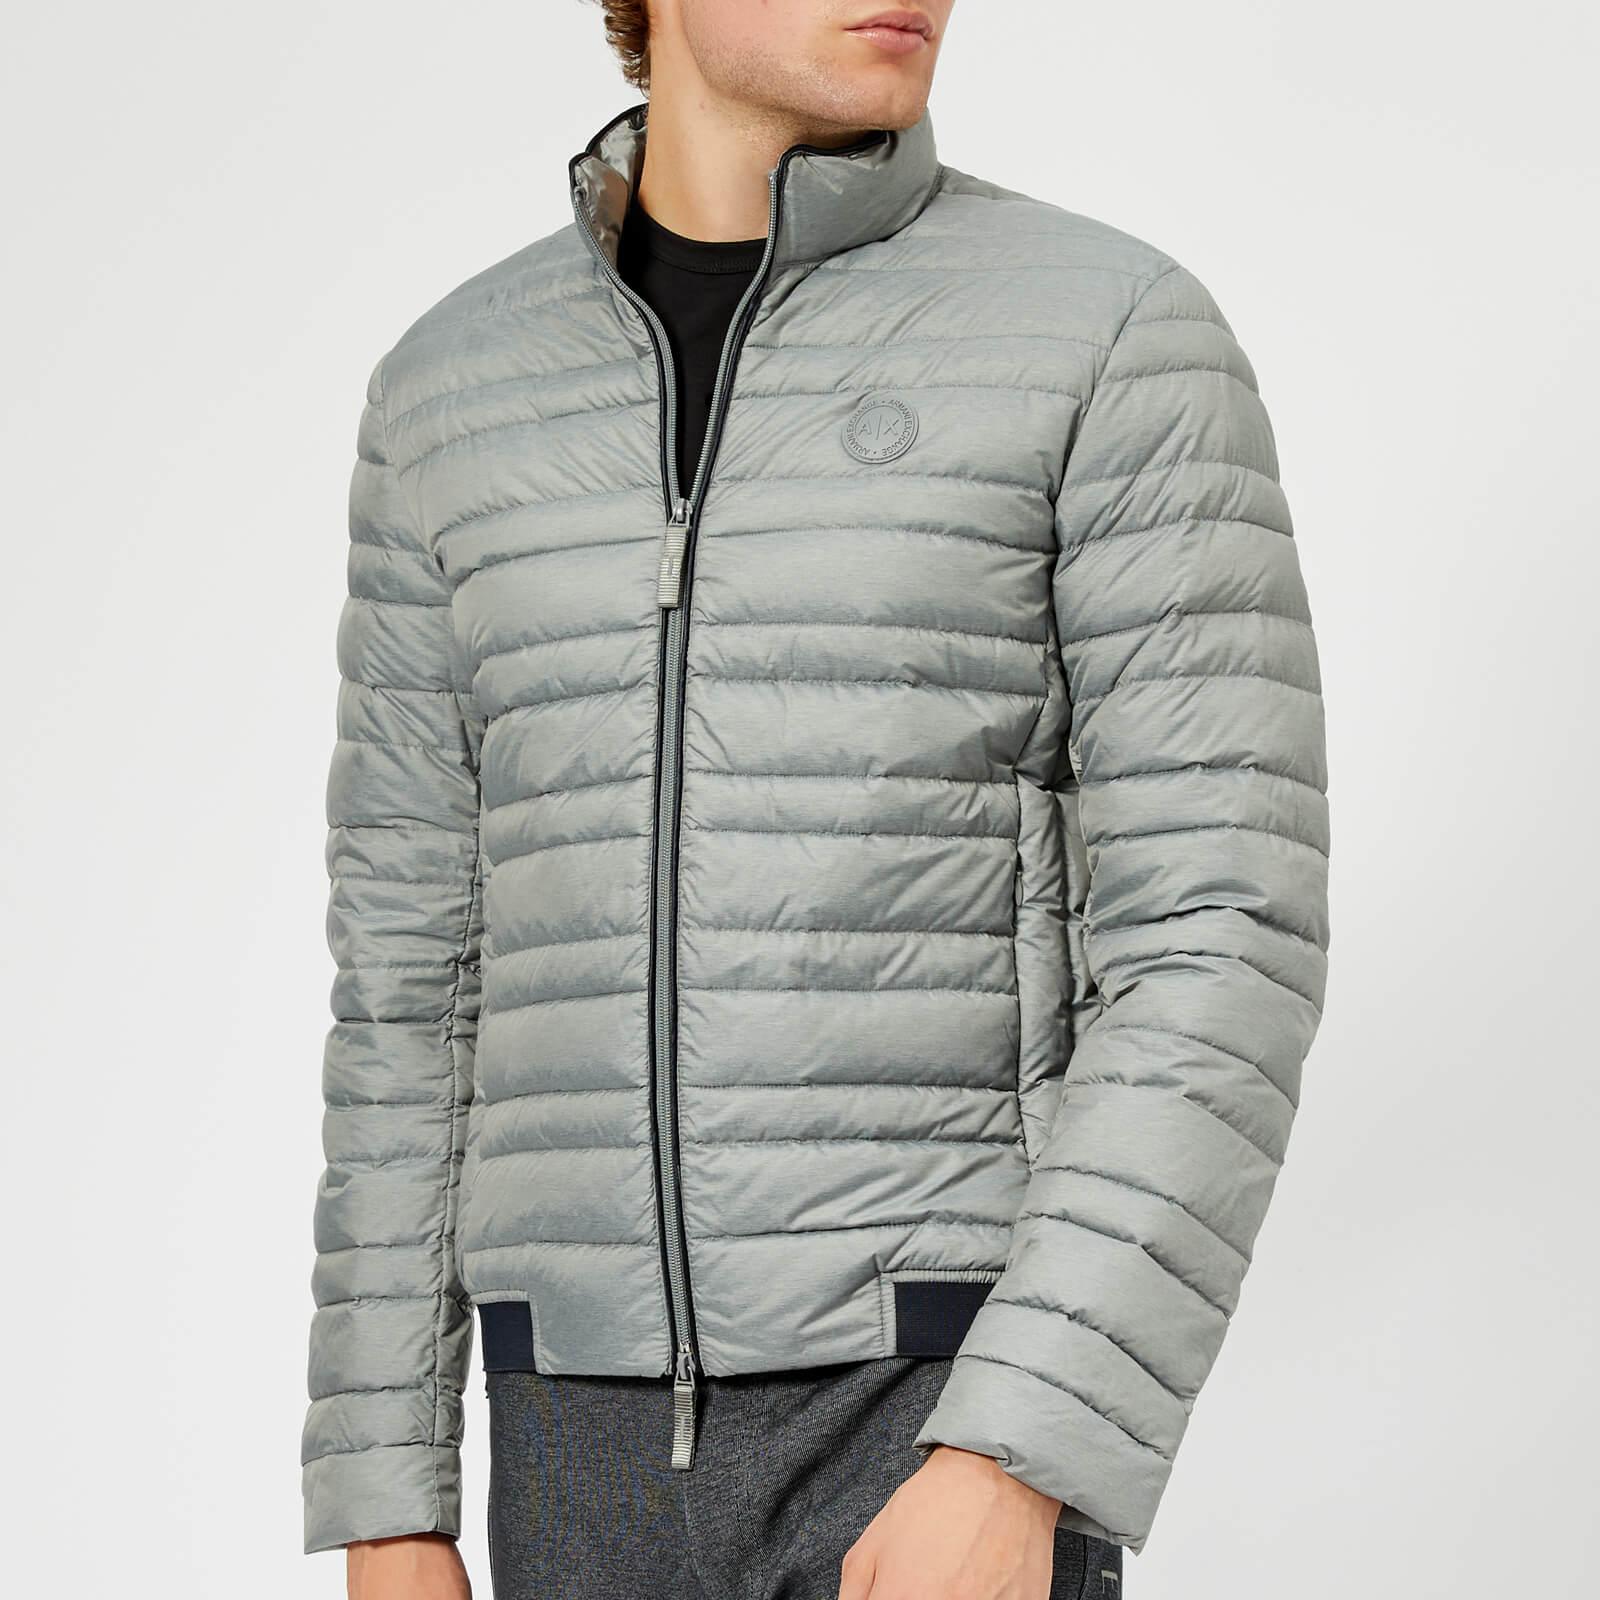 5df7ad156a Armani Exchange Men's Down Jacket - Grey/Navy